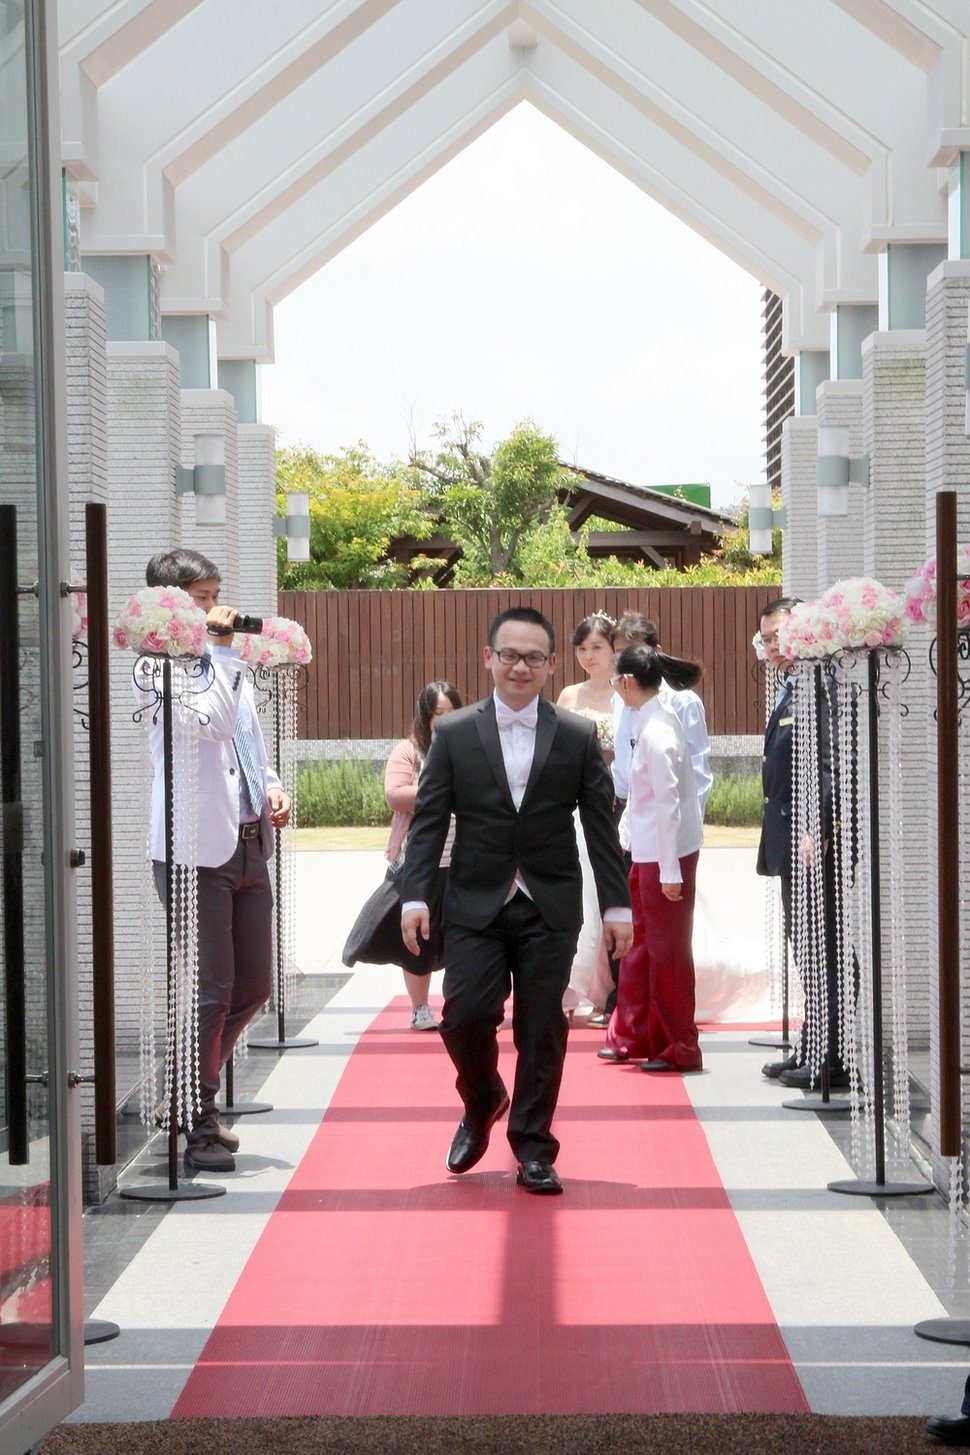 IMG_0077 - 瑞比特婚禮紀錄攝影 - 結婚吧